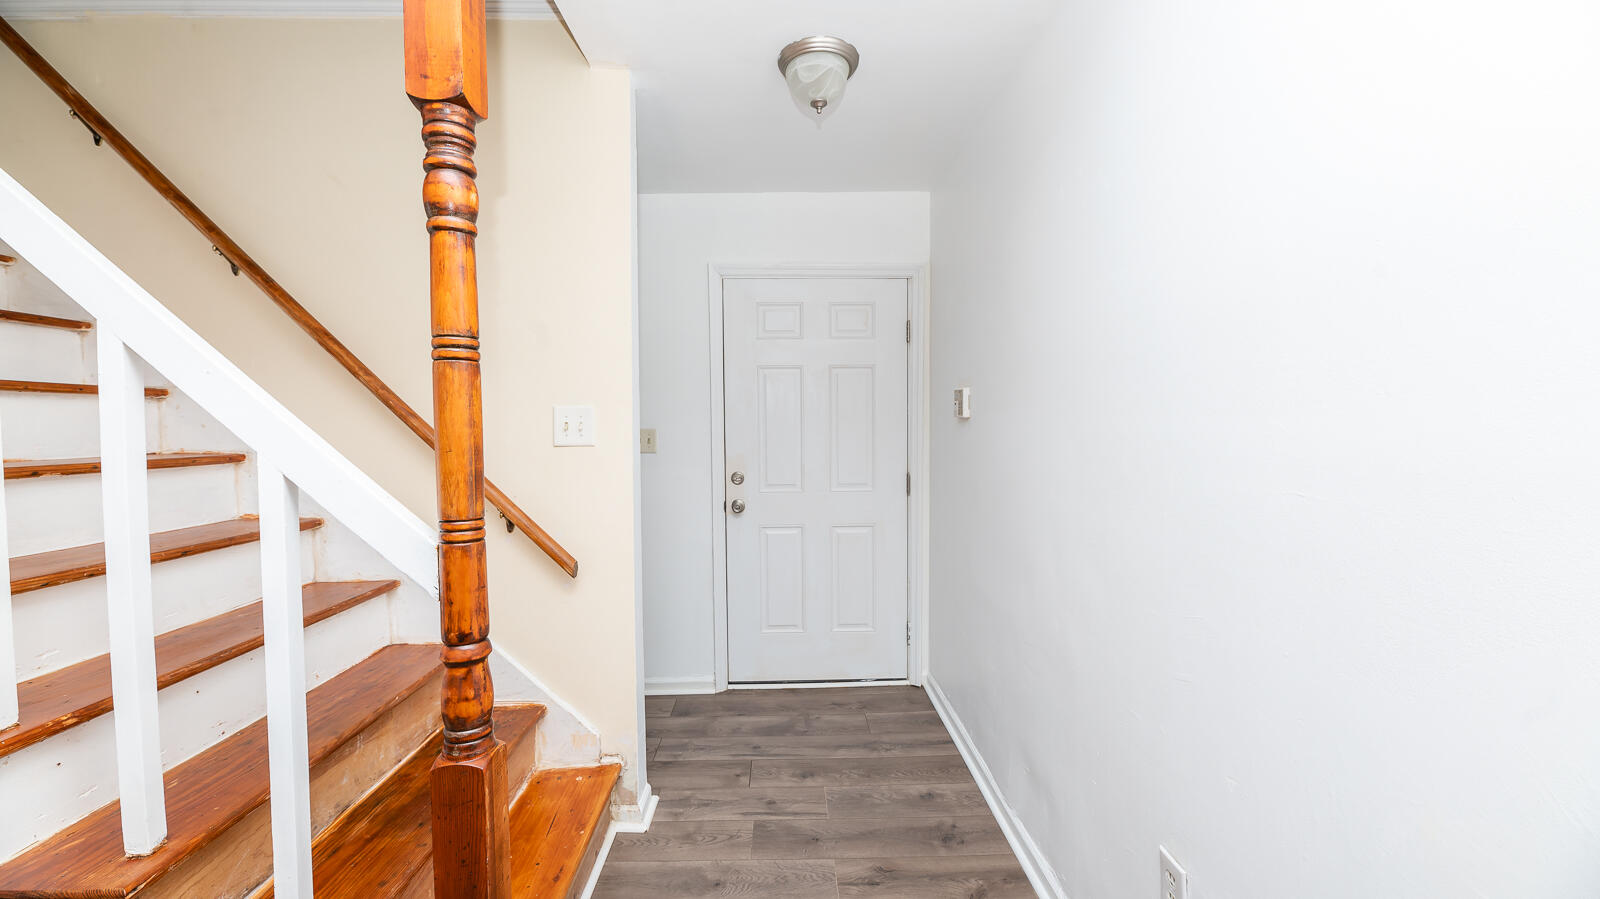 Ashley Villas Homes For Sale - 4315 Briarstone, North Charleston, SC - 29